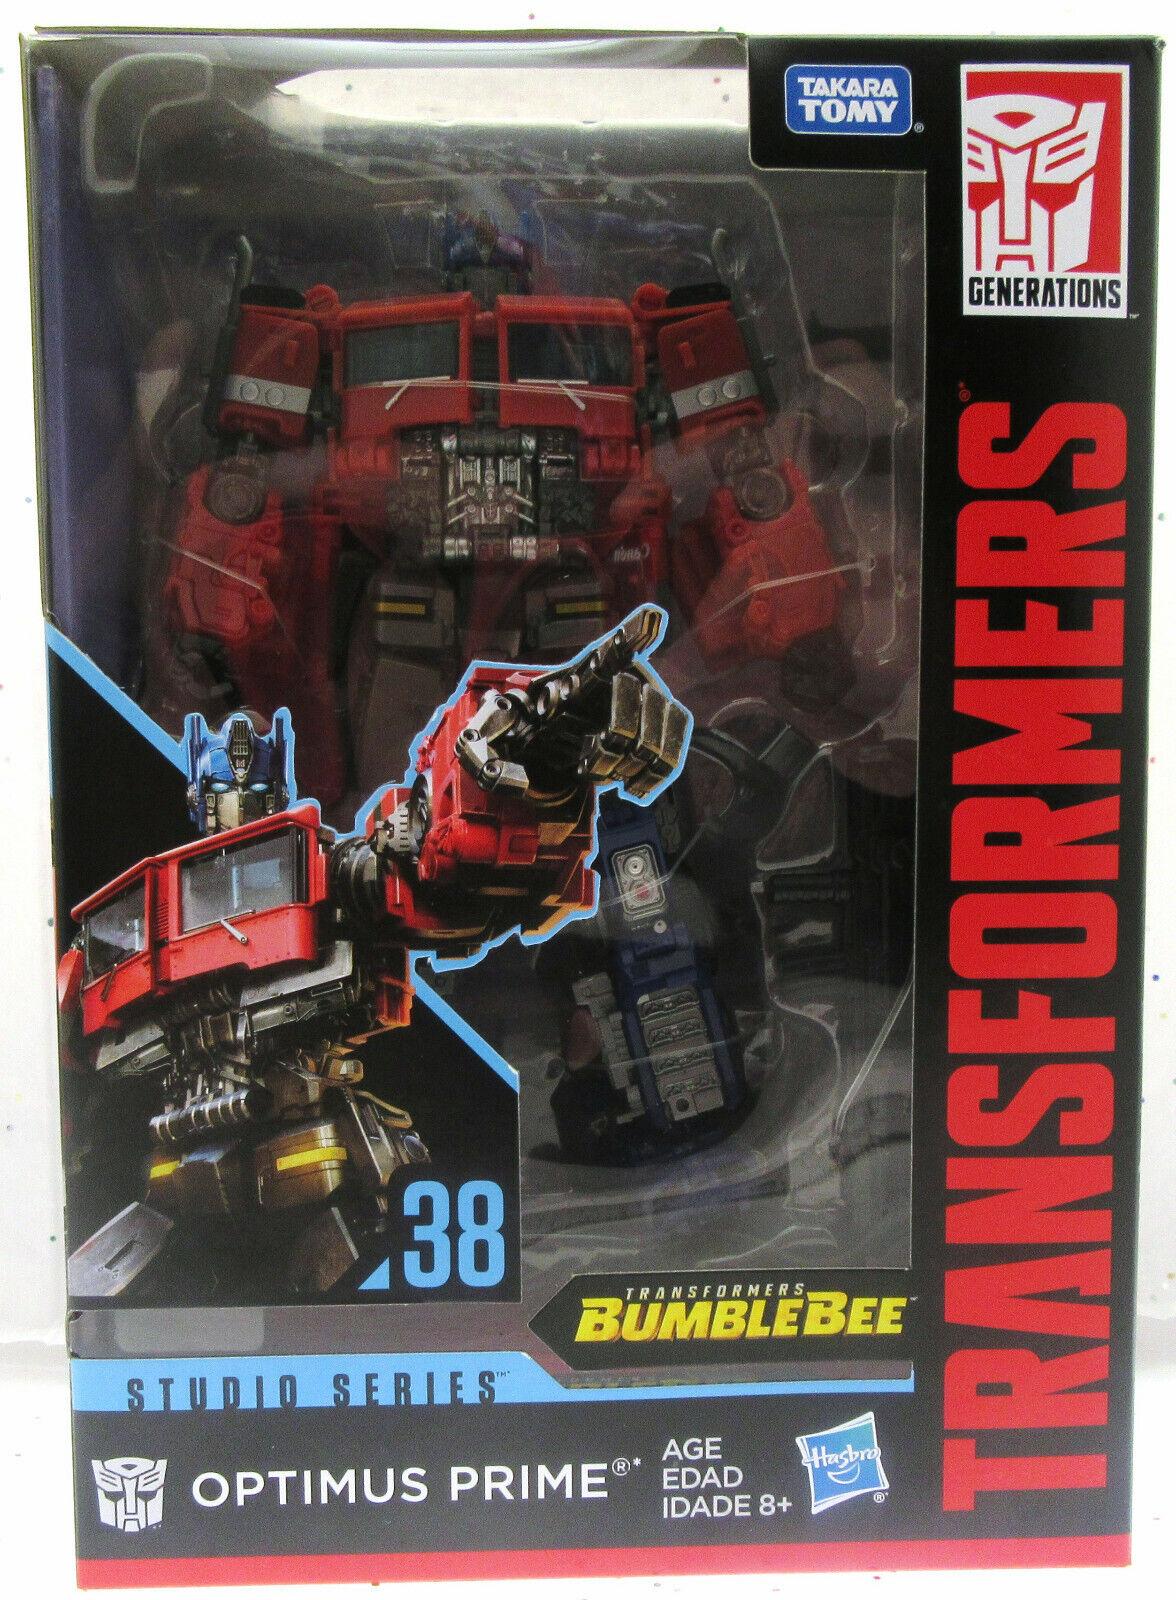 TRANSFORMERS  Optimus Prime 38  Studio Series  Autobot  Hasbro